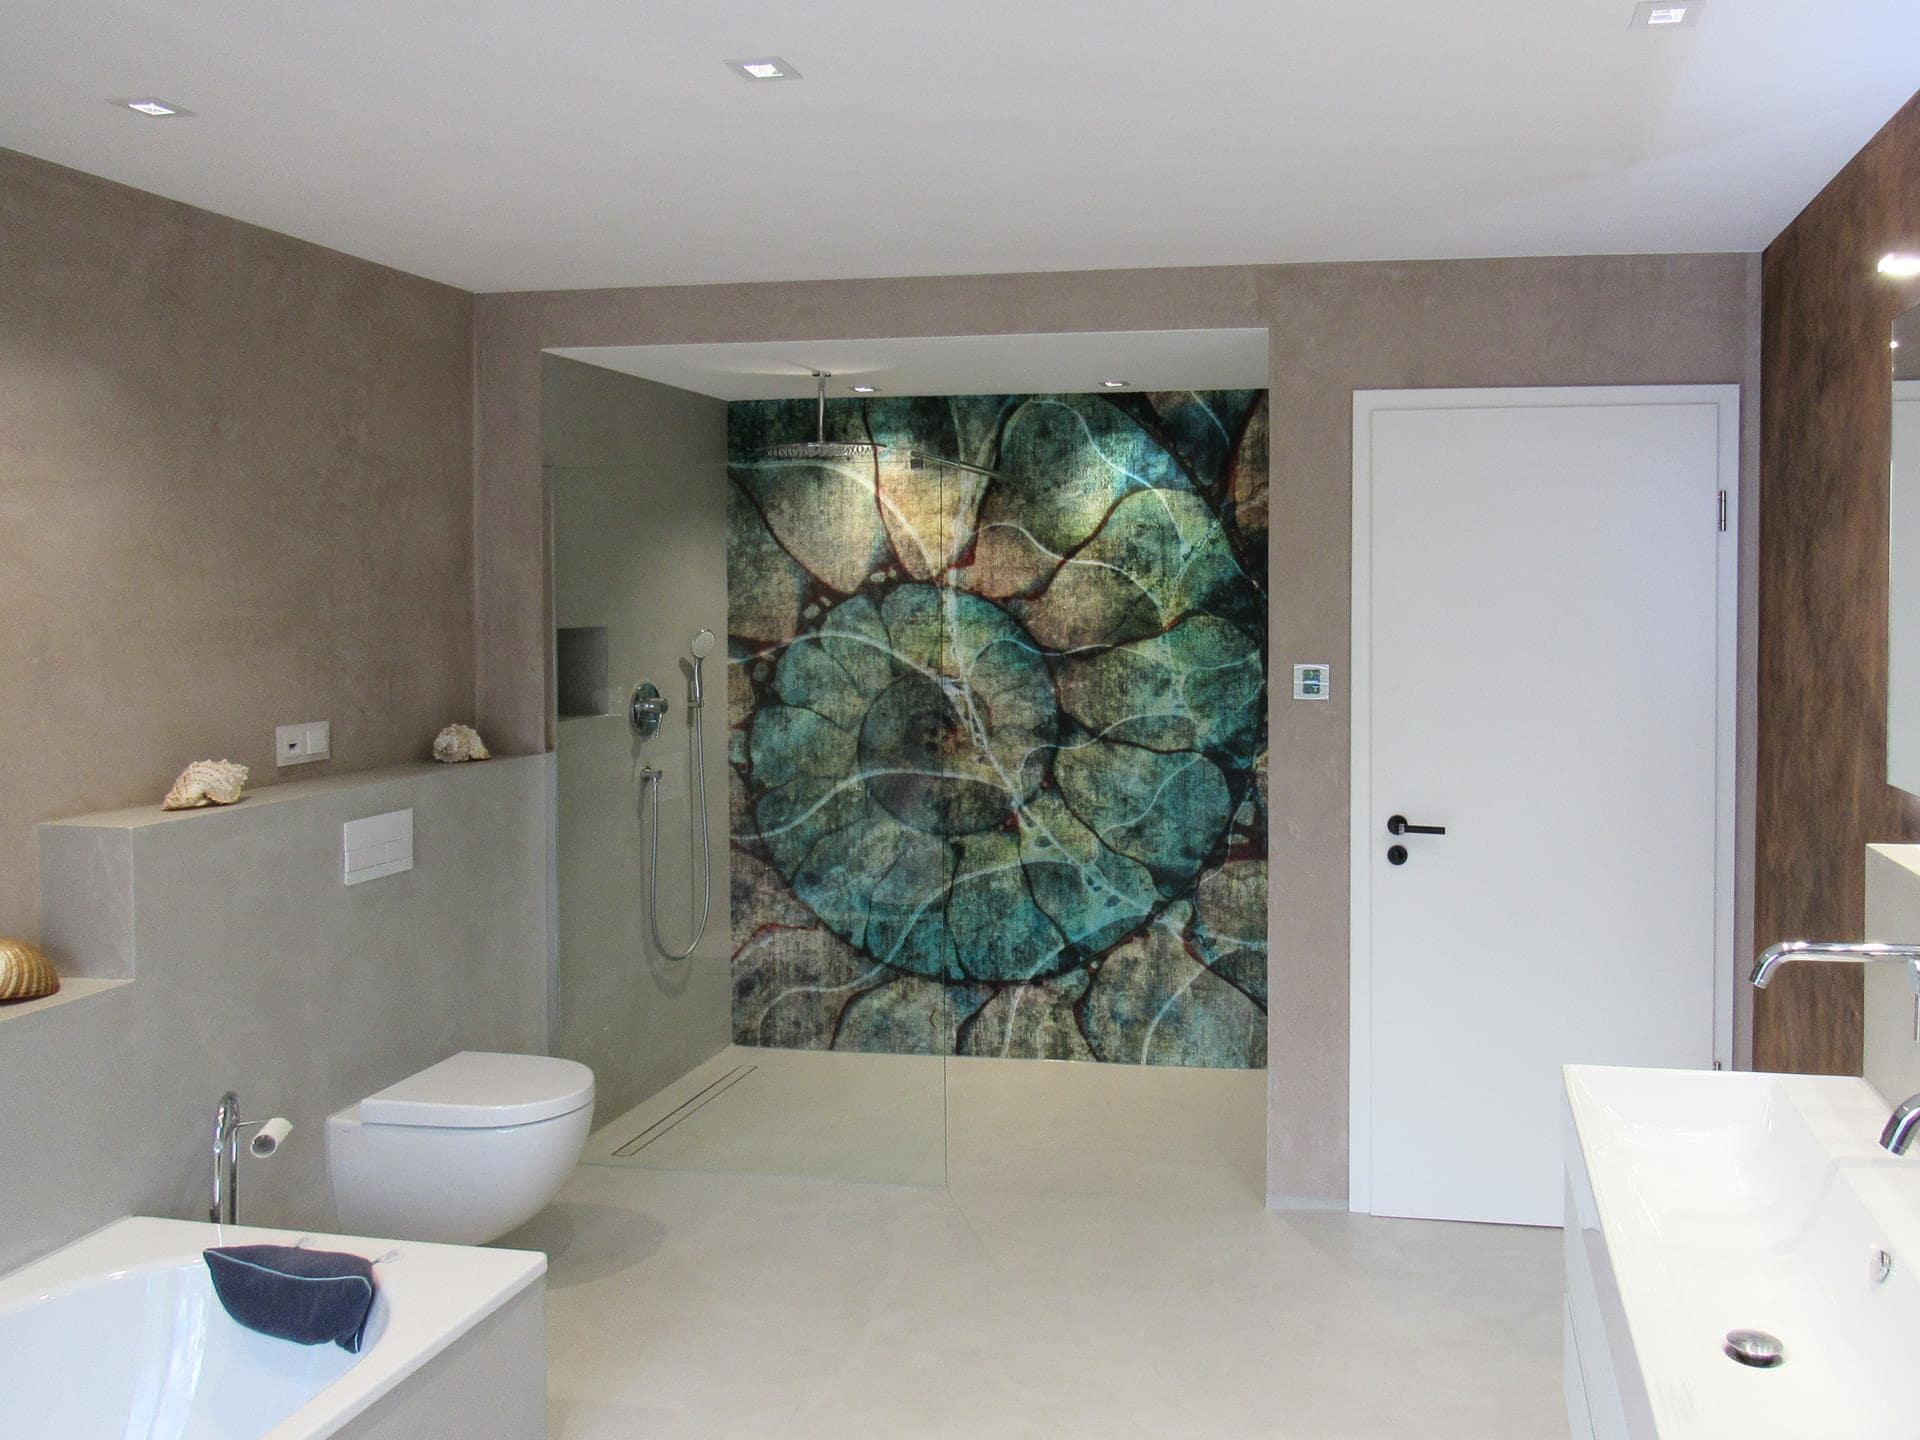 Glamora & Fugenlos Badezimmer Tapeten   DER GESTALTUNGSMALER